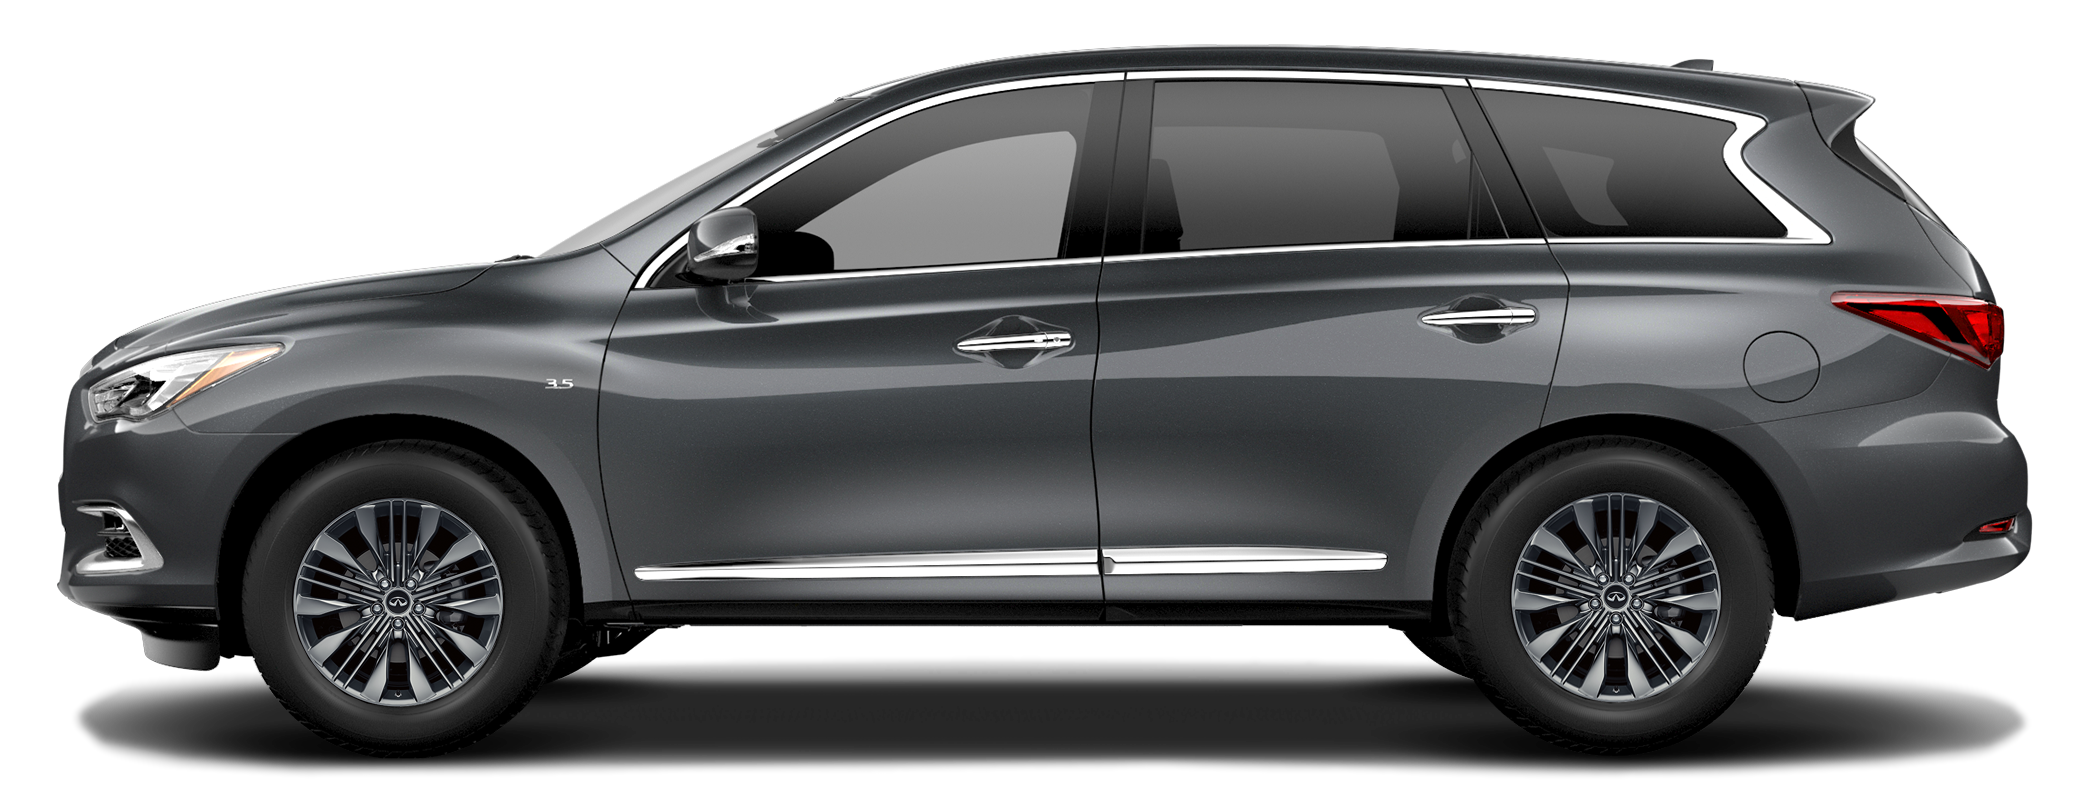 2019 INFINITI QX60 SUV LUXE